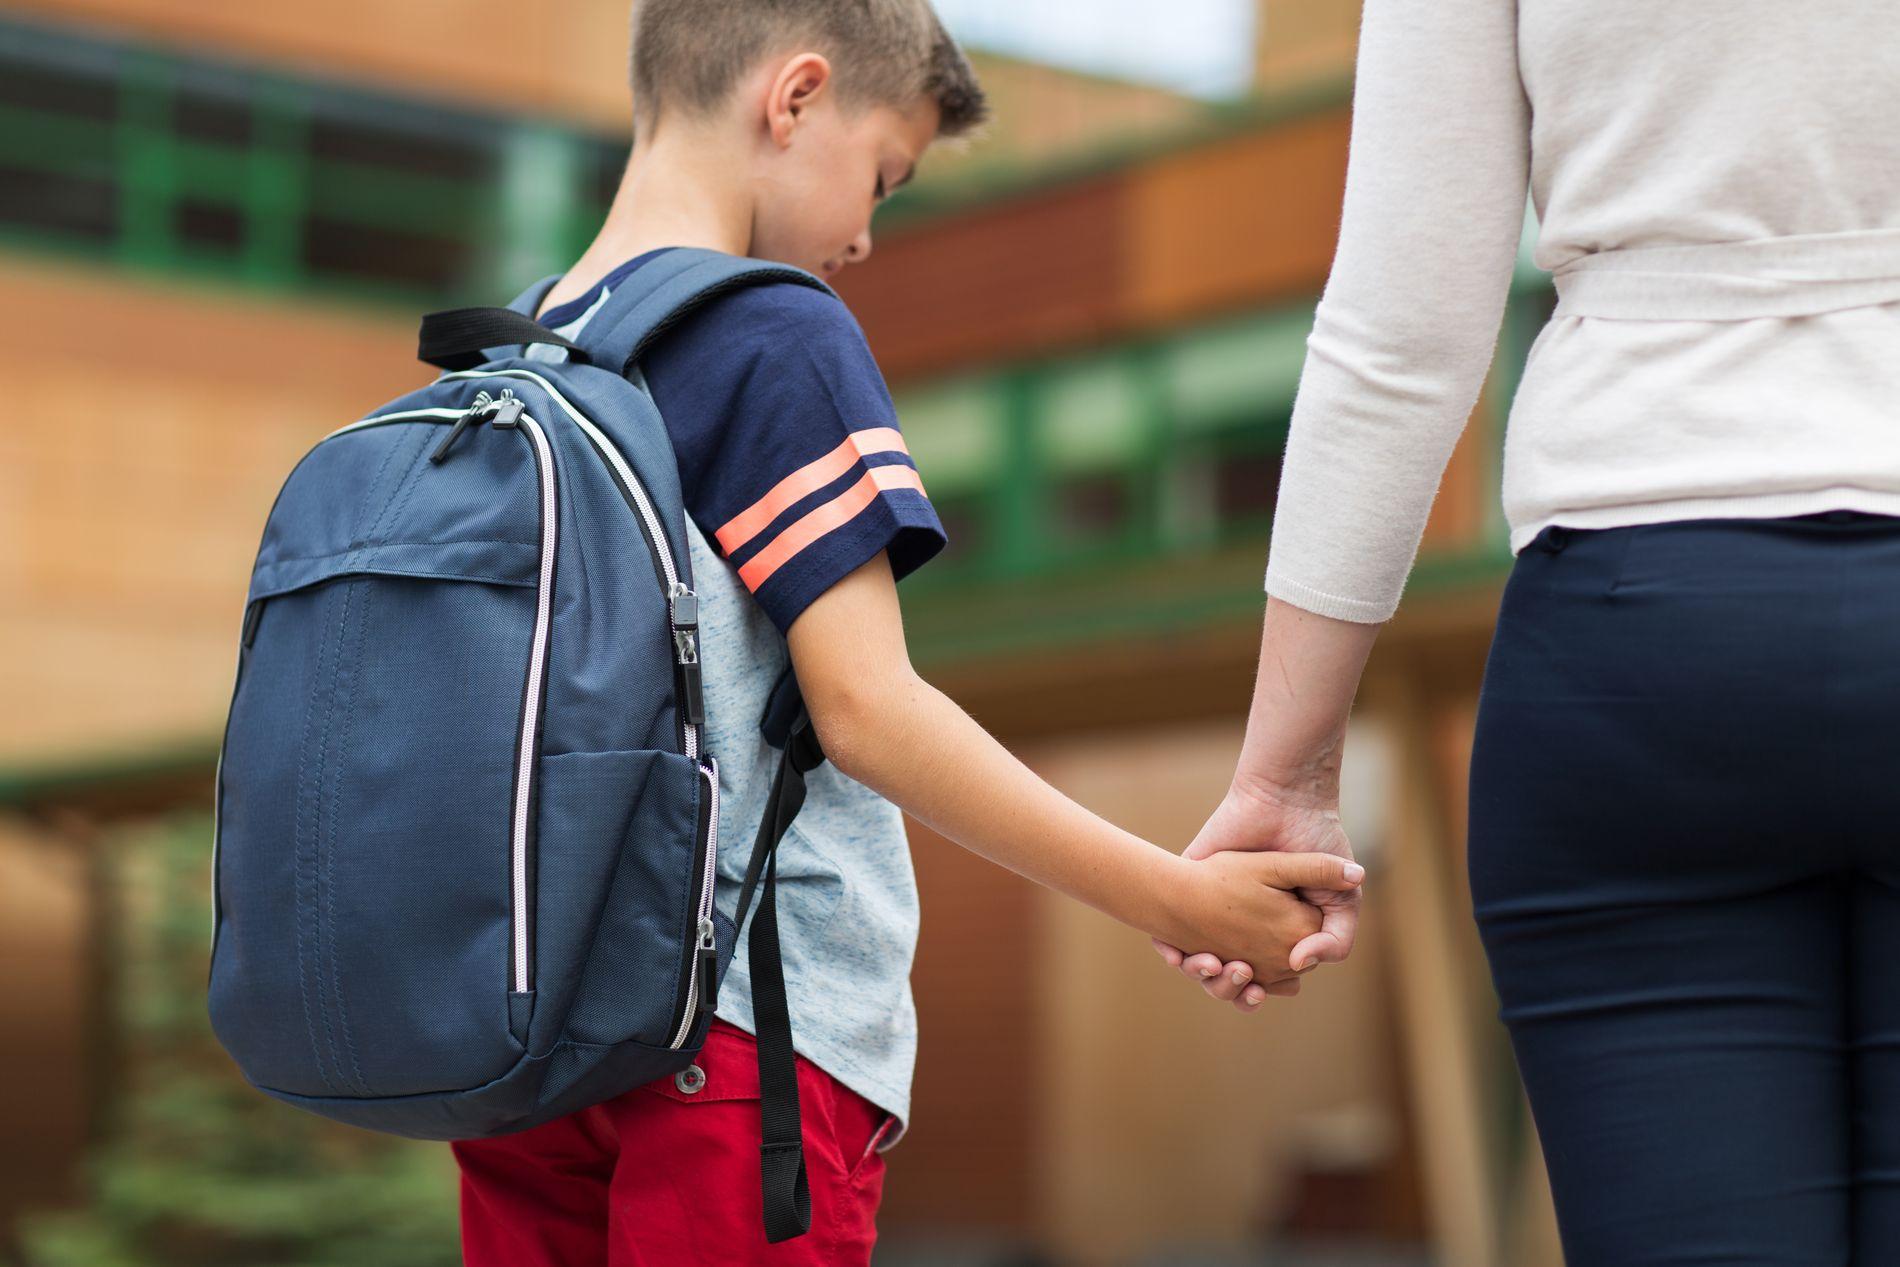 MOBBING: I løpet av et femårig studium får vi som er lektorstudenter tilbud om et par seminarer om mobbing, skriver Sara Berge Økland.